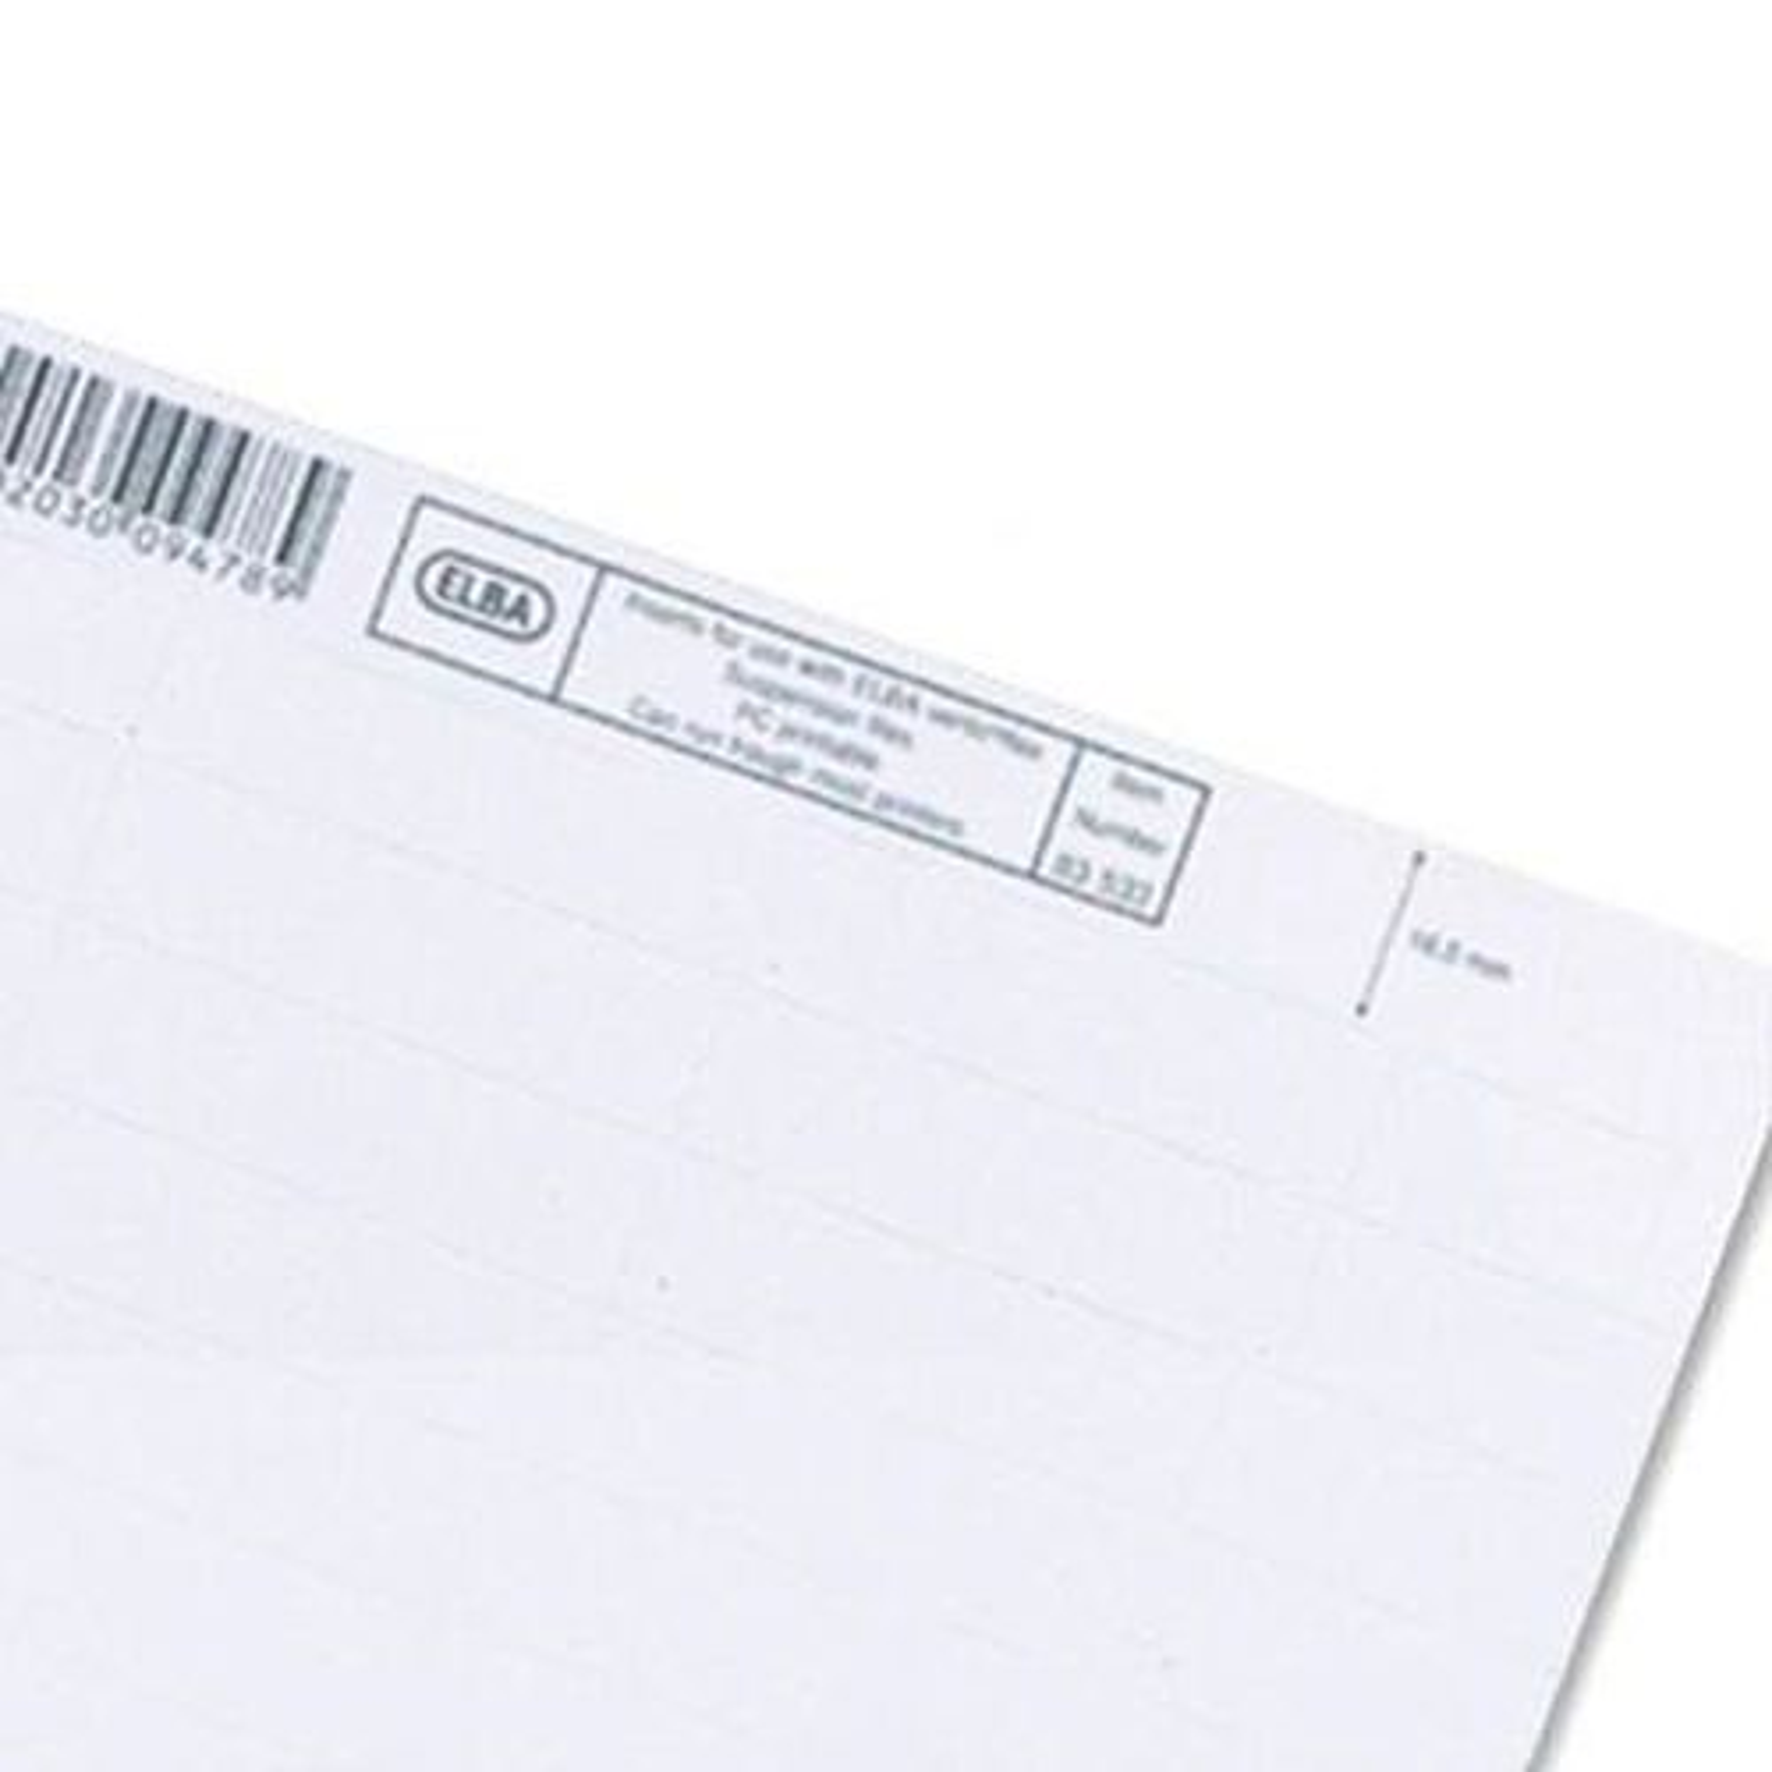 Elba Verticfile Inserts White (50) 100330219